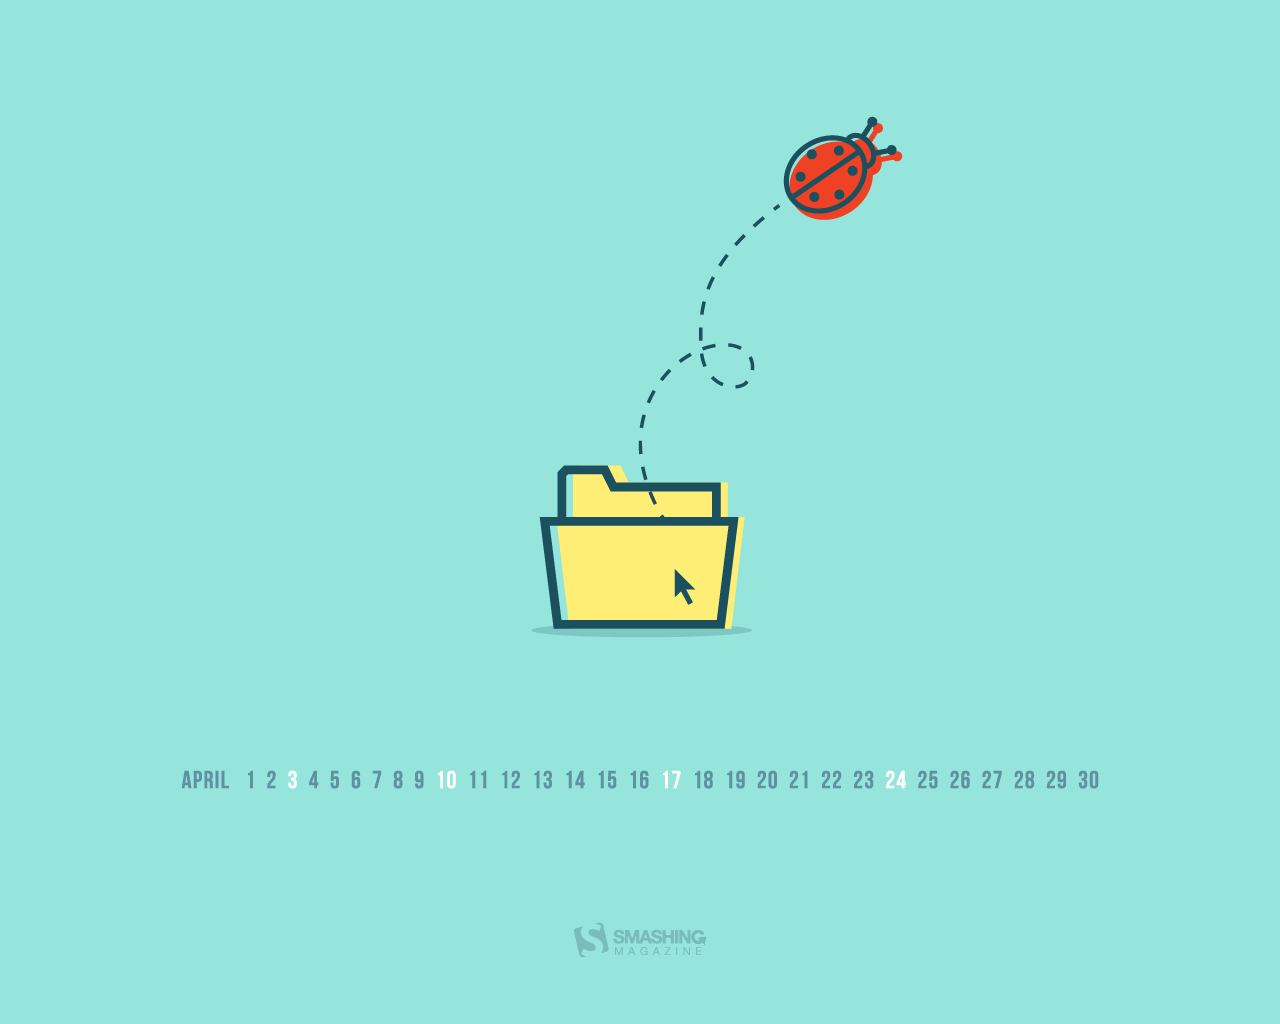 Desktop Wallpapers Calendar April 2016  Wallpaper Cave